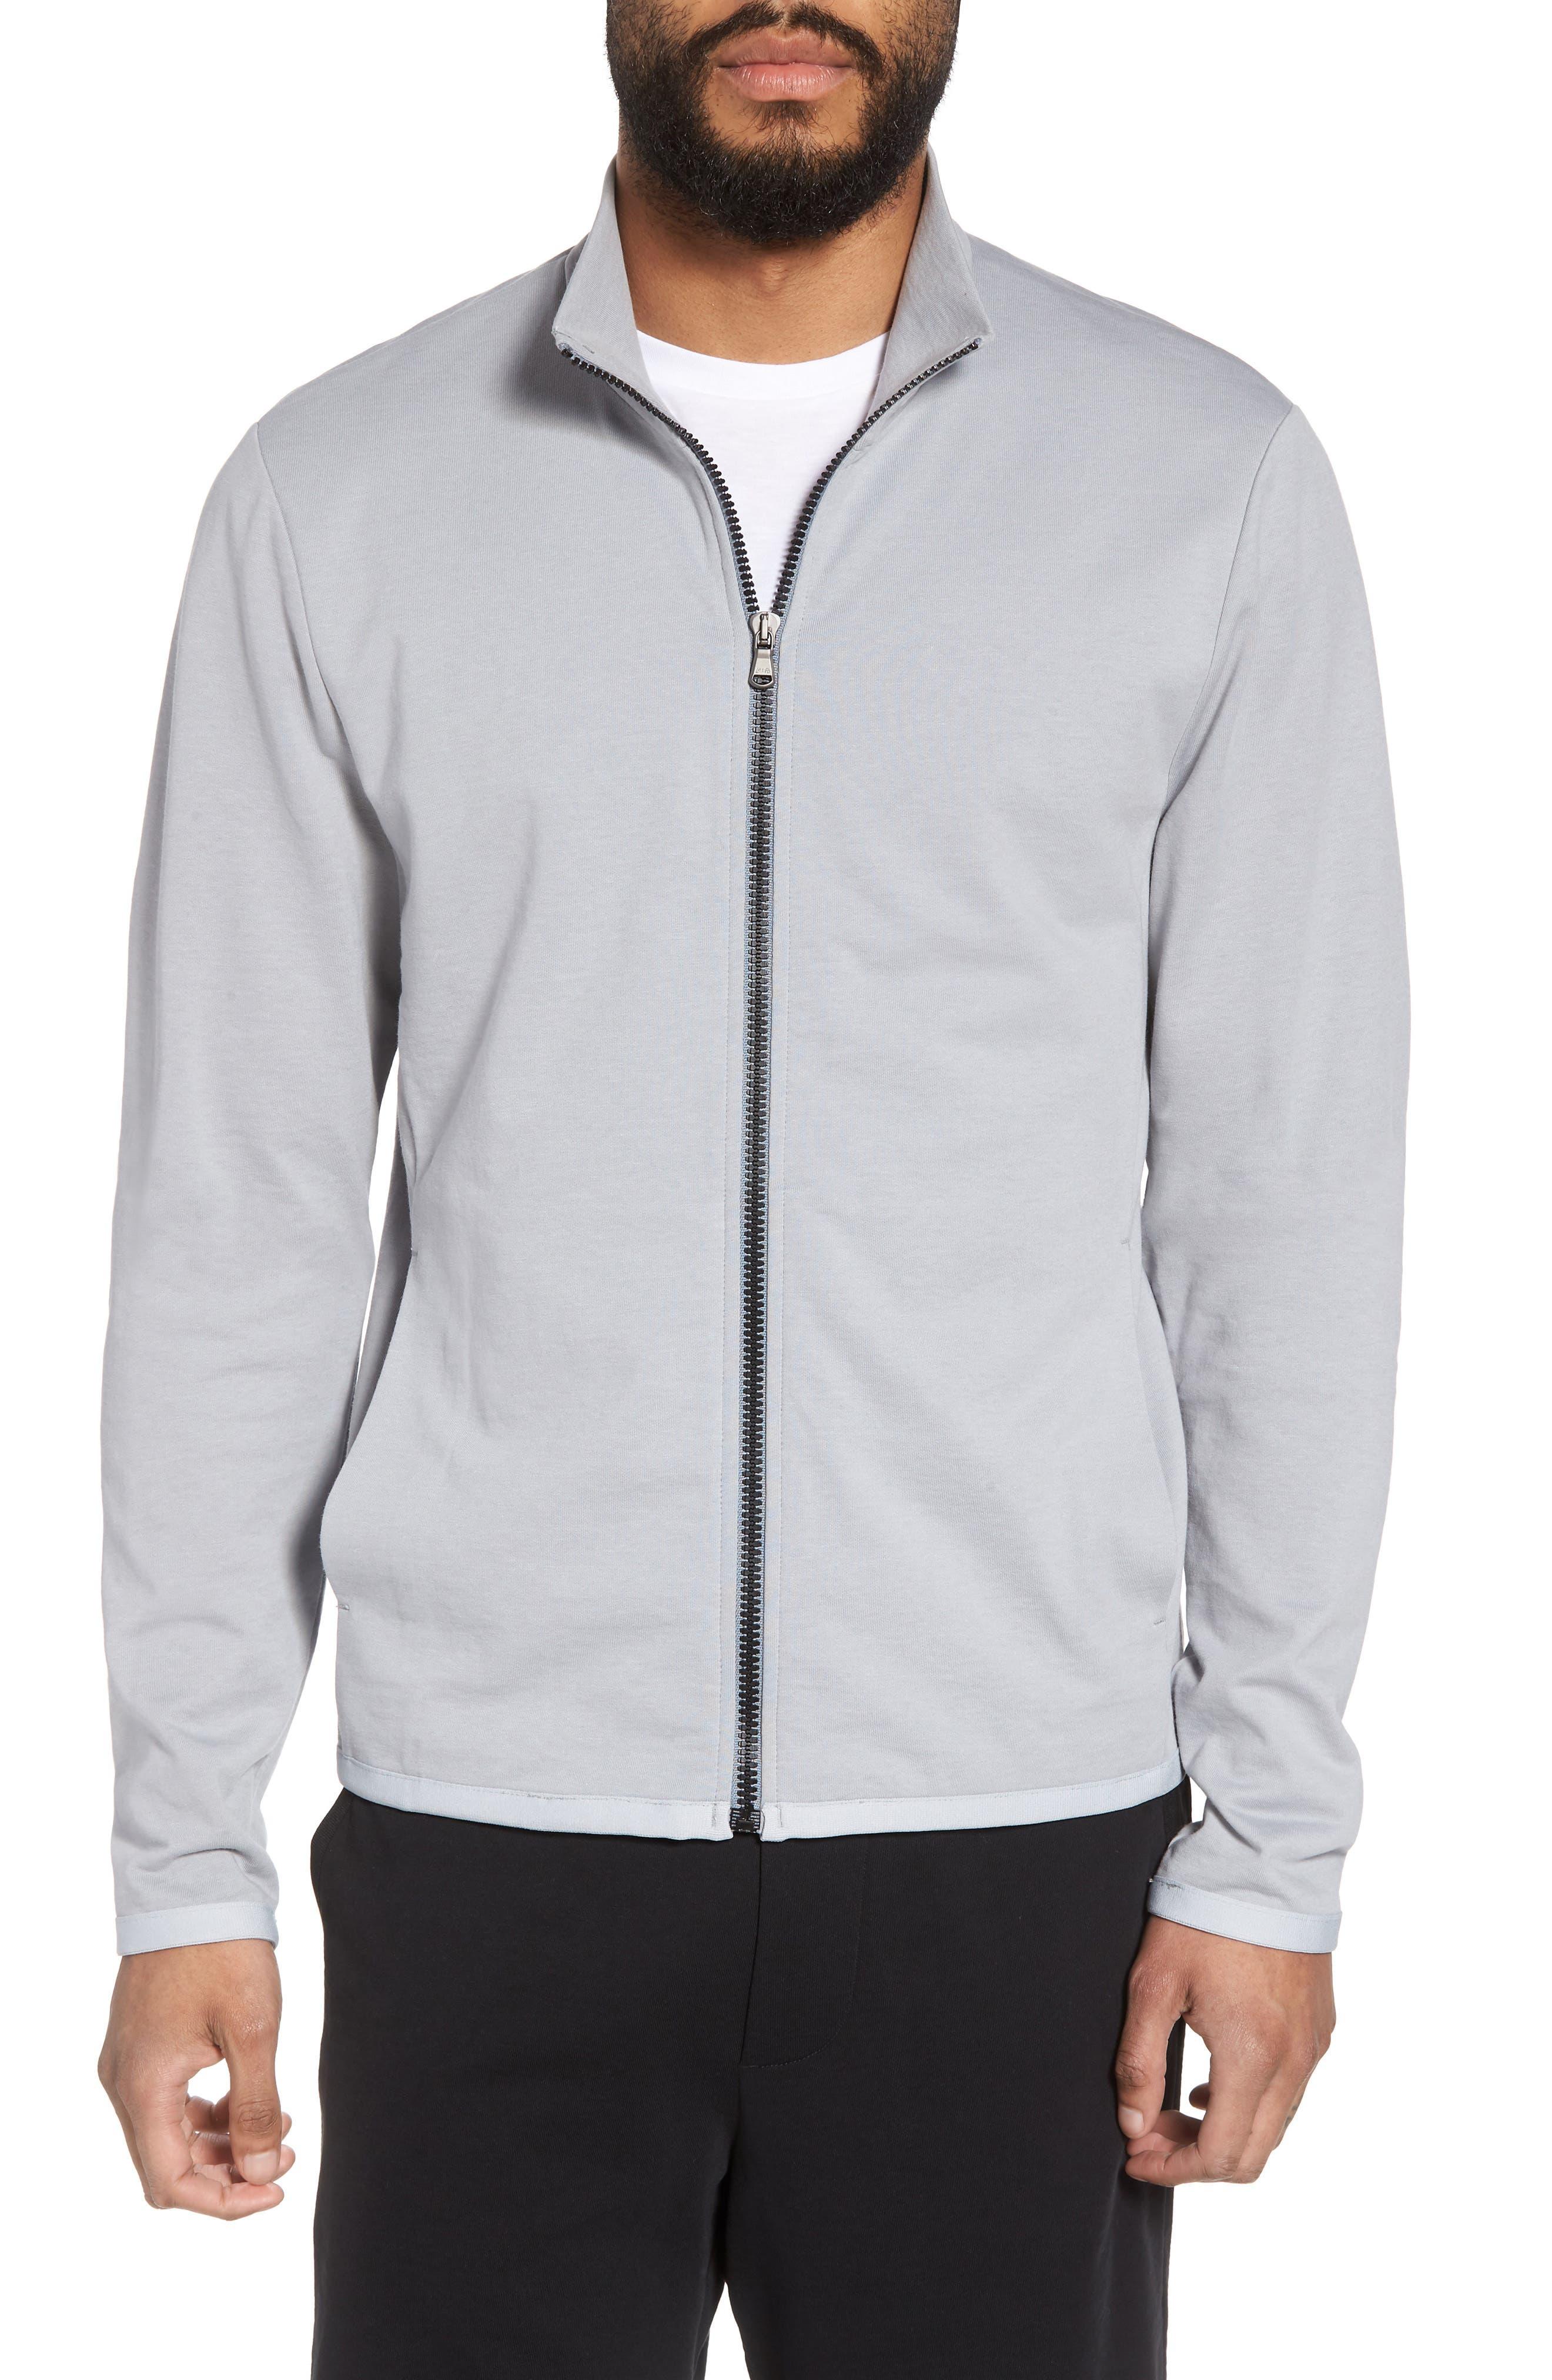 Slim Fit Compact Terry Zip Jacket,                             Main thumbnail 1, color,                             Grey Sky/ Light Grey